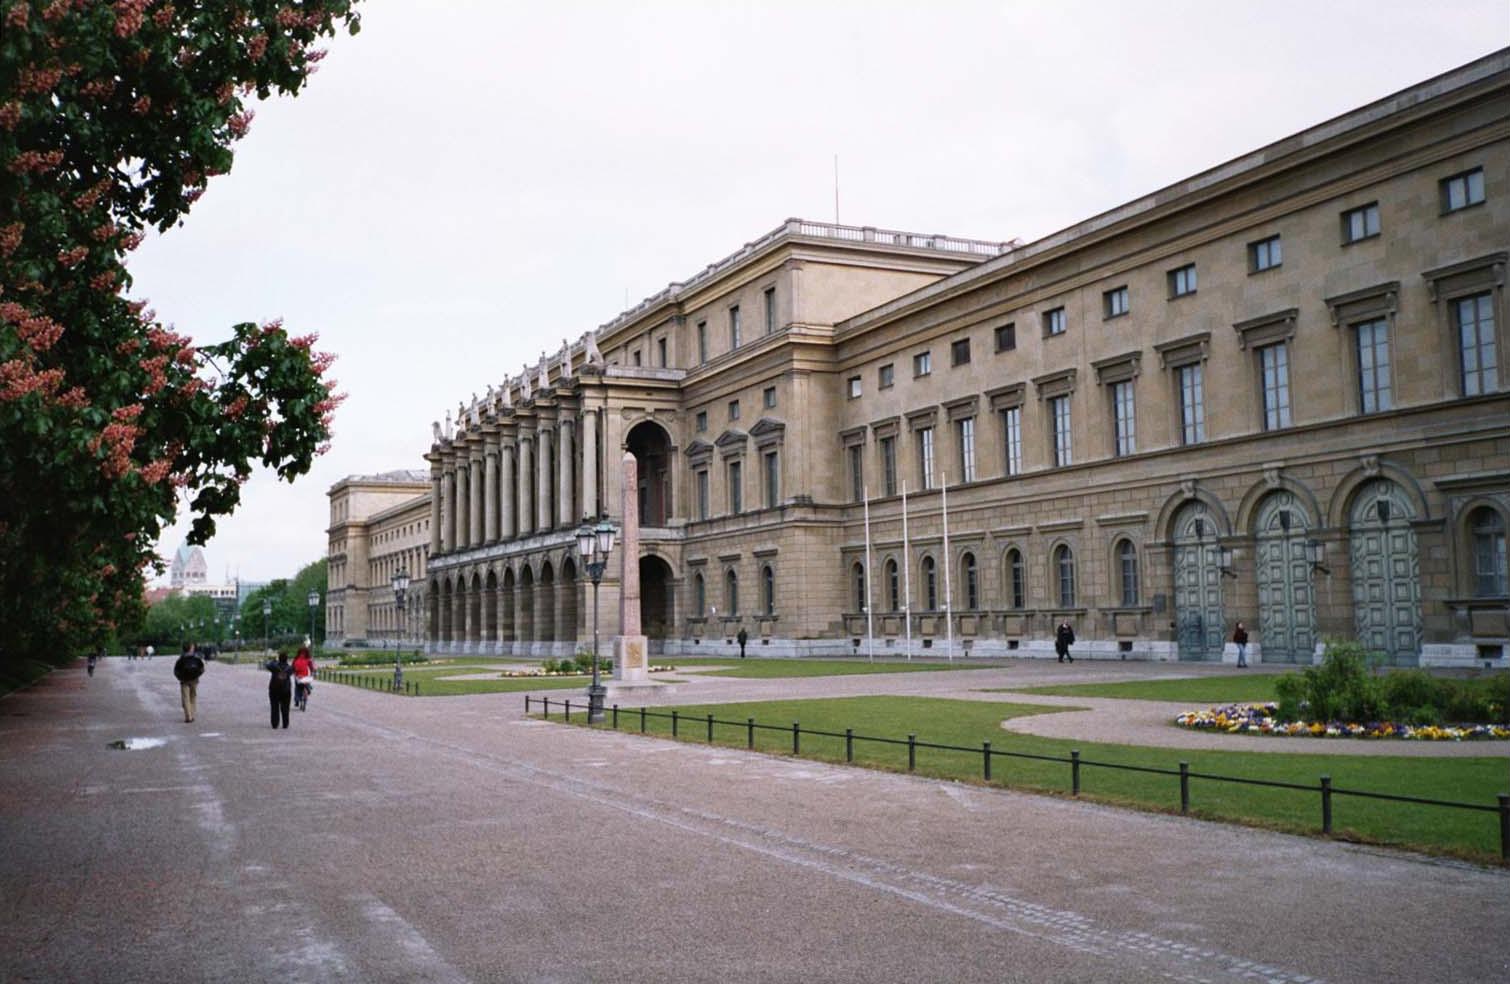 Di Baviera Di Residenza Residenza Monaco Wikipedia Baviera Monaco erdxoCB